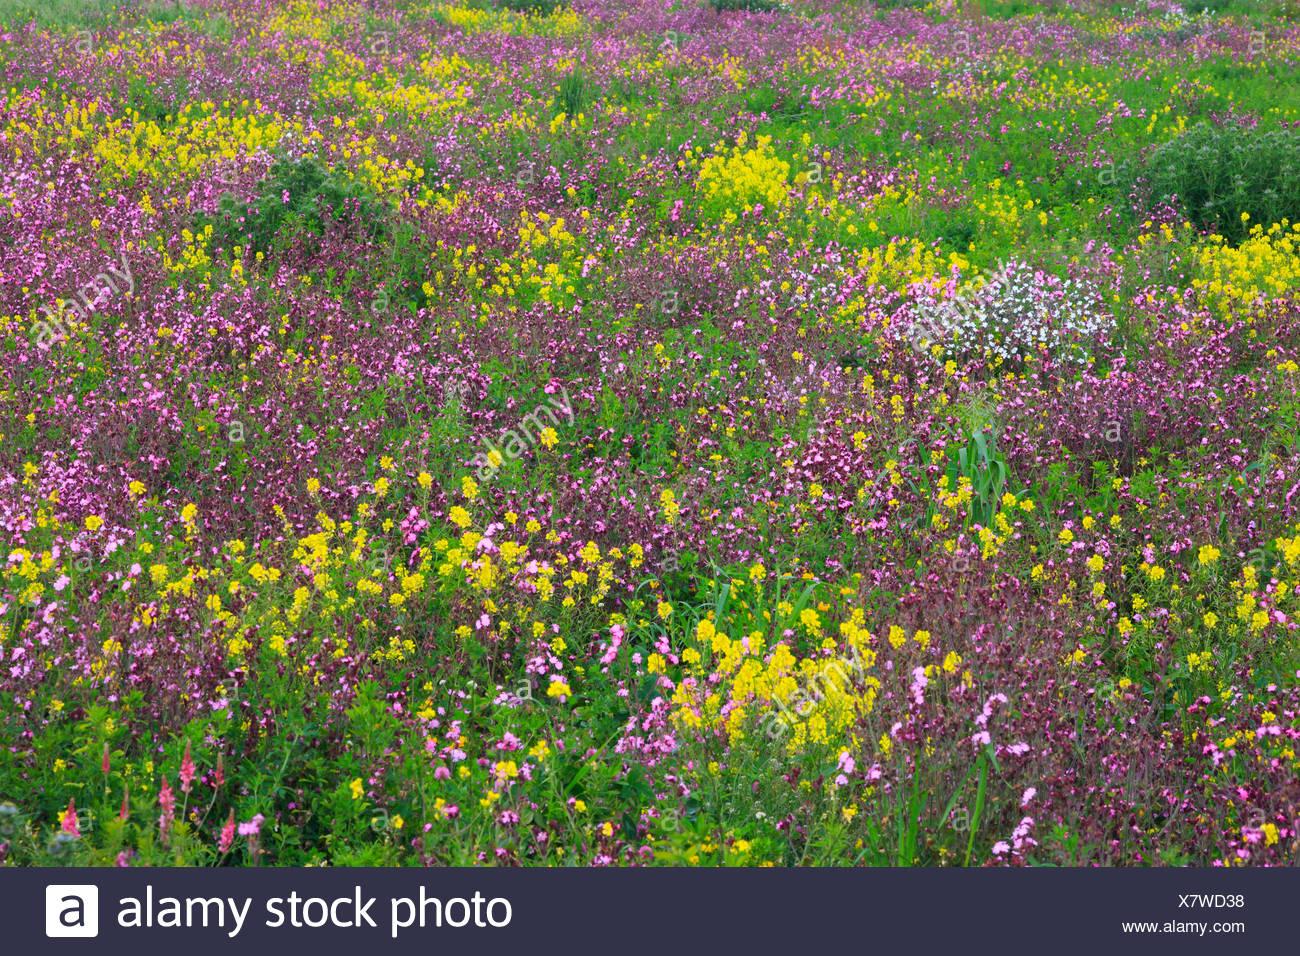 Detail flower flower meadow detail england spring spring flowers detail flower flower meadow detail england spring spring flowers spring meadow great britain europe background pattern mightylinksfo